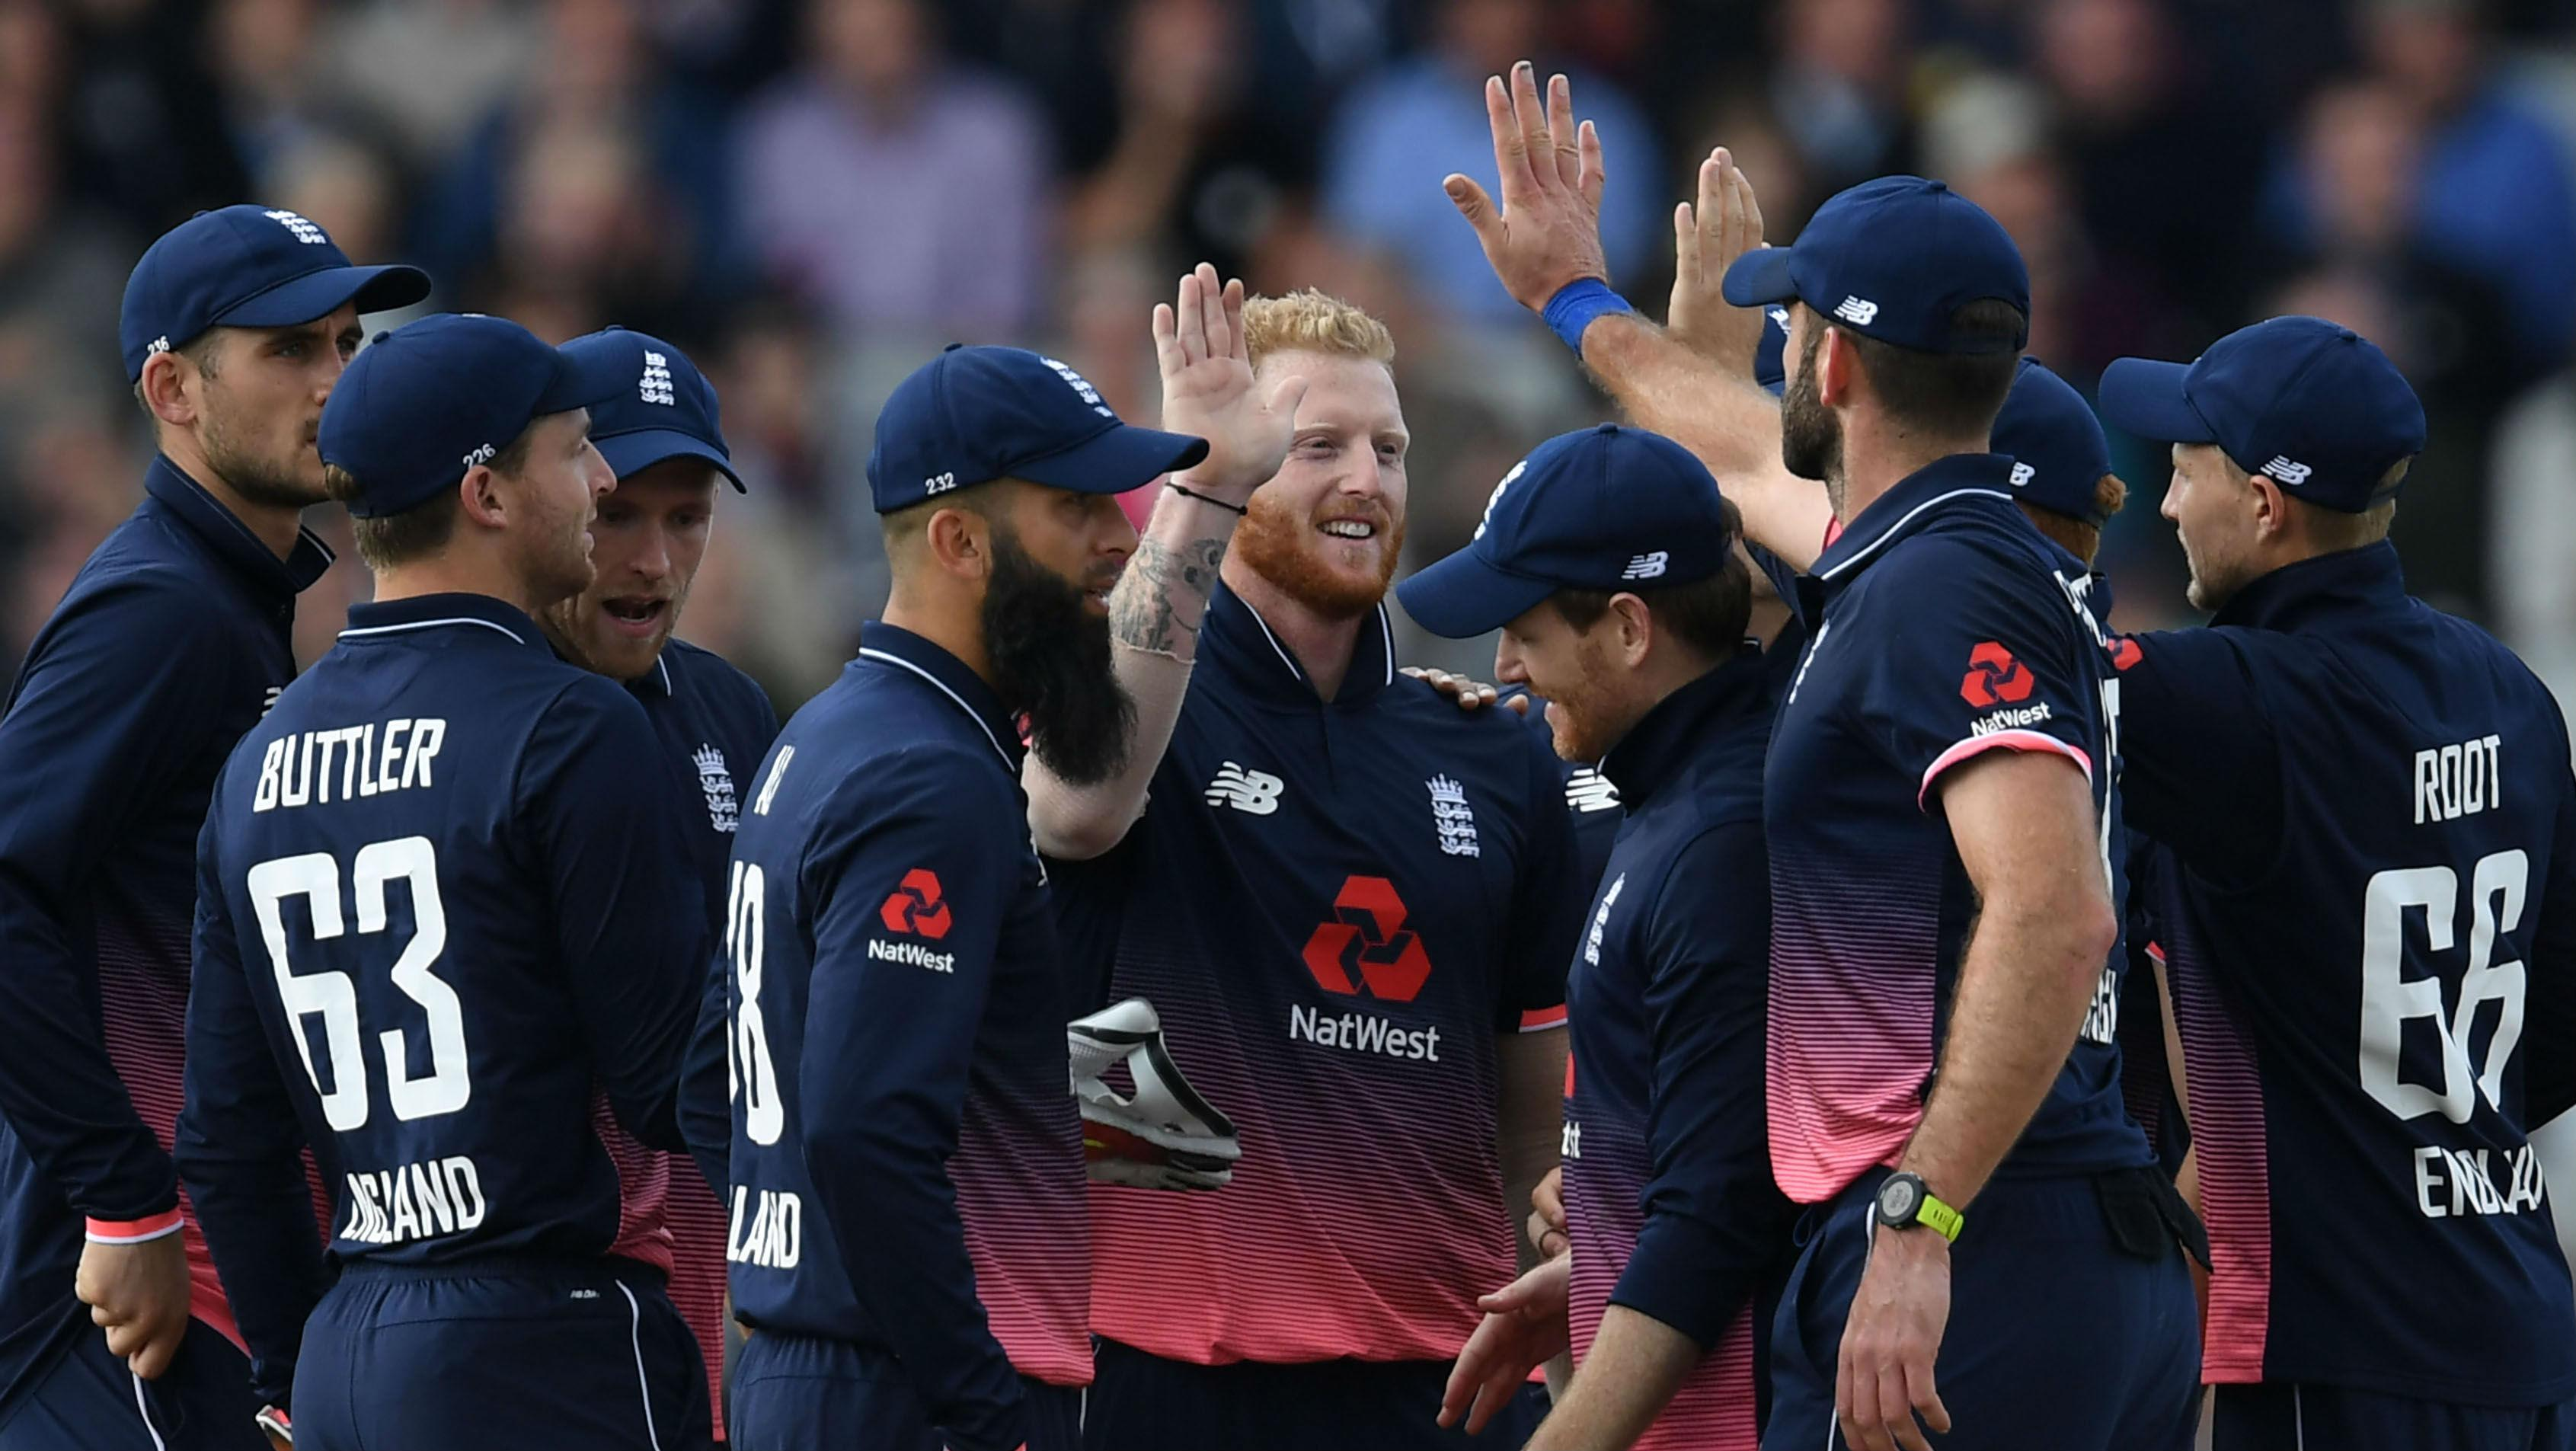 Windies seeks turnaround against England